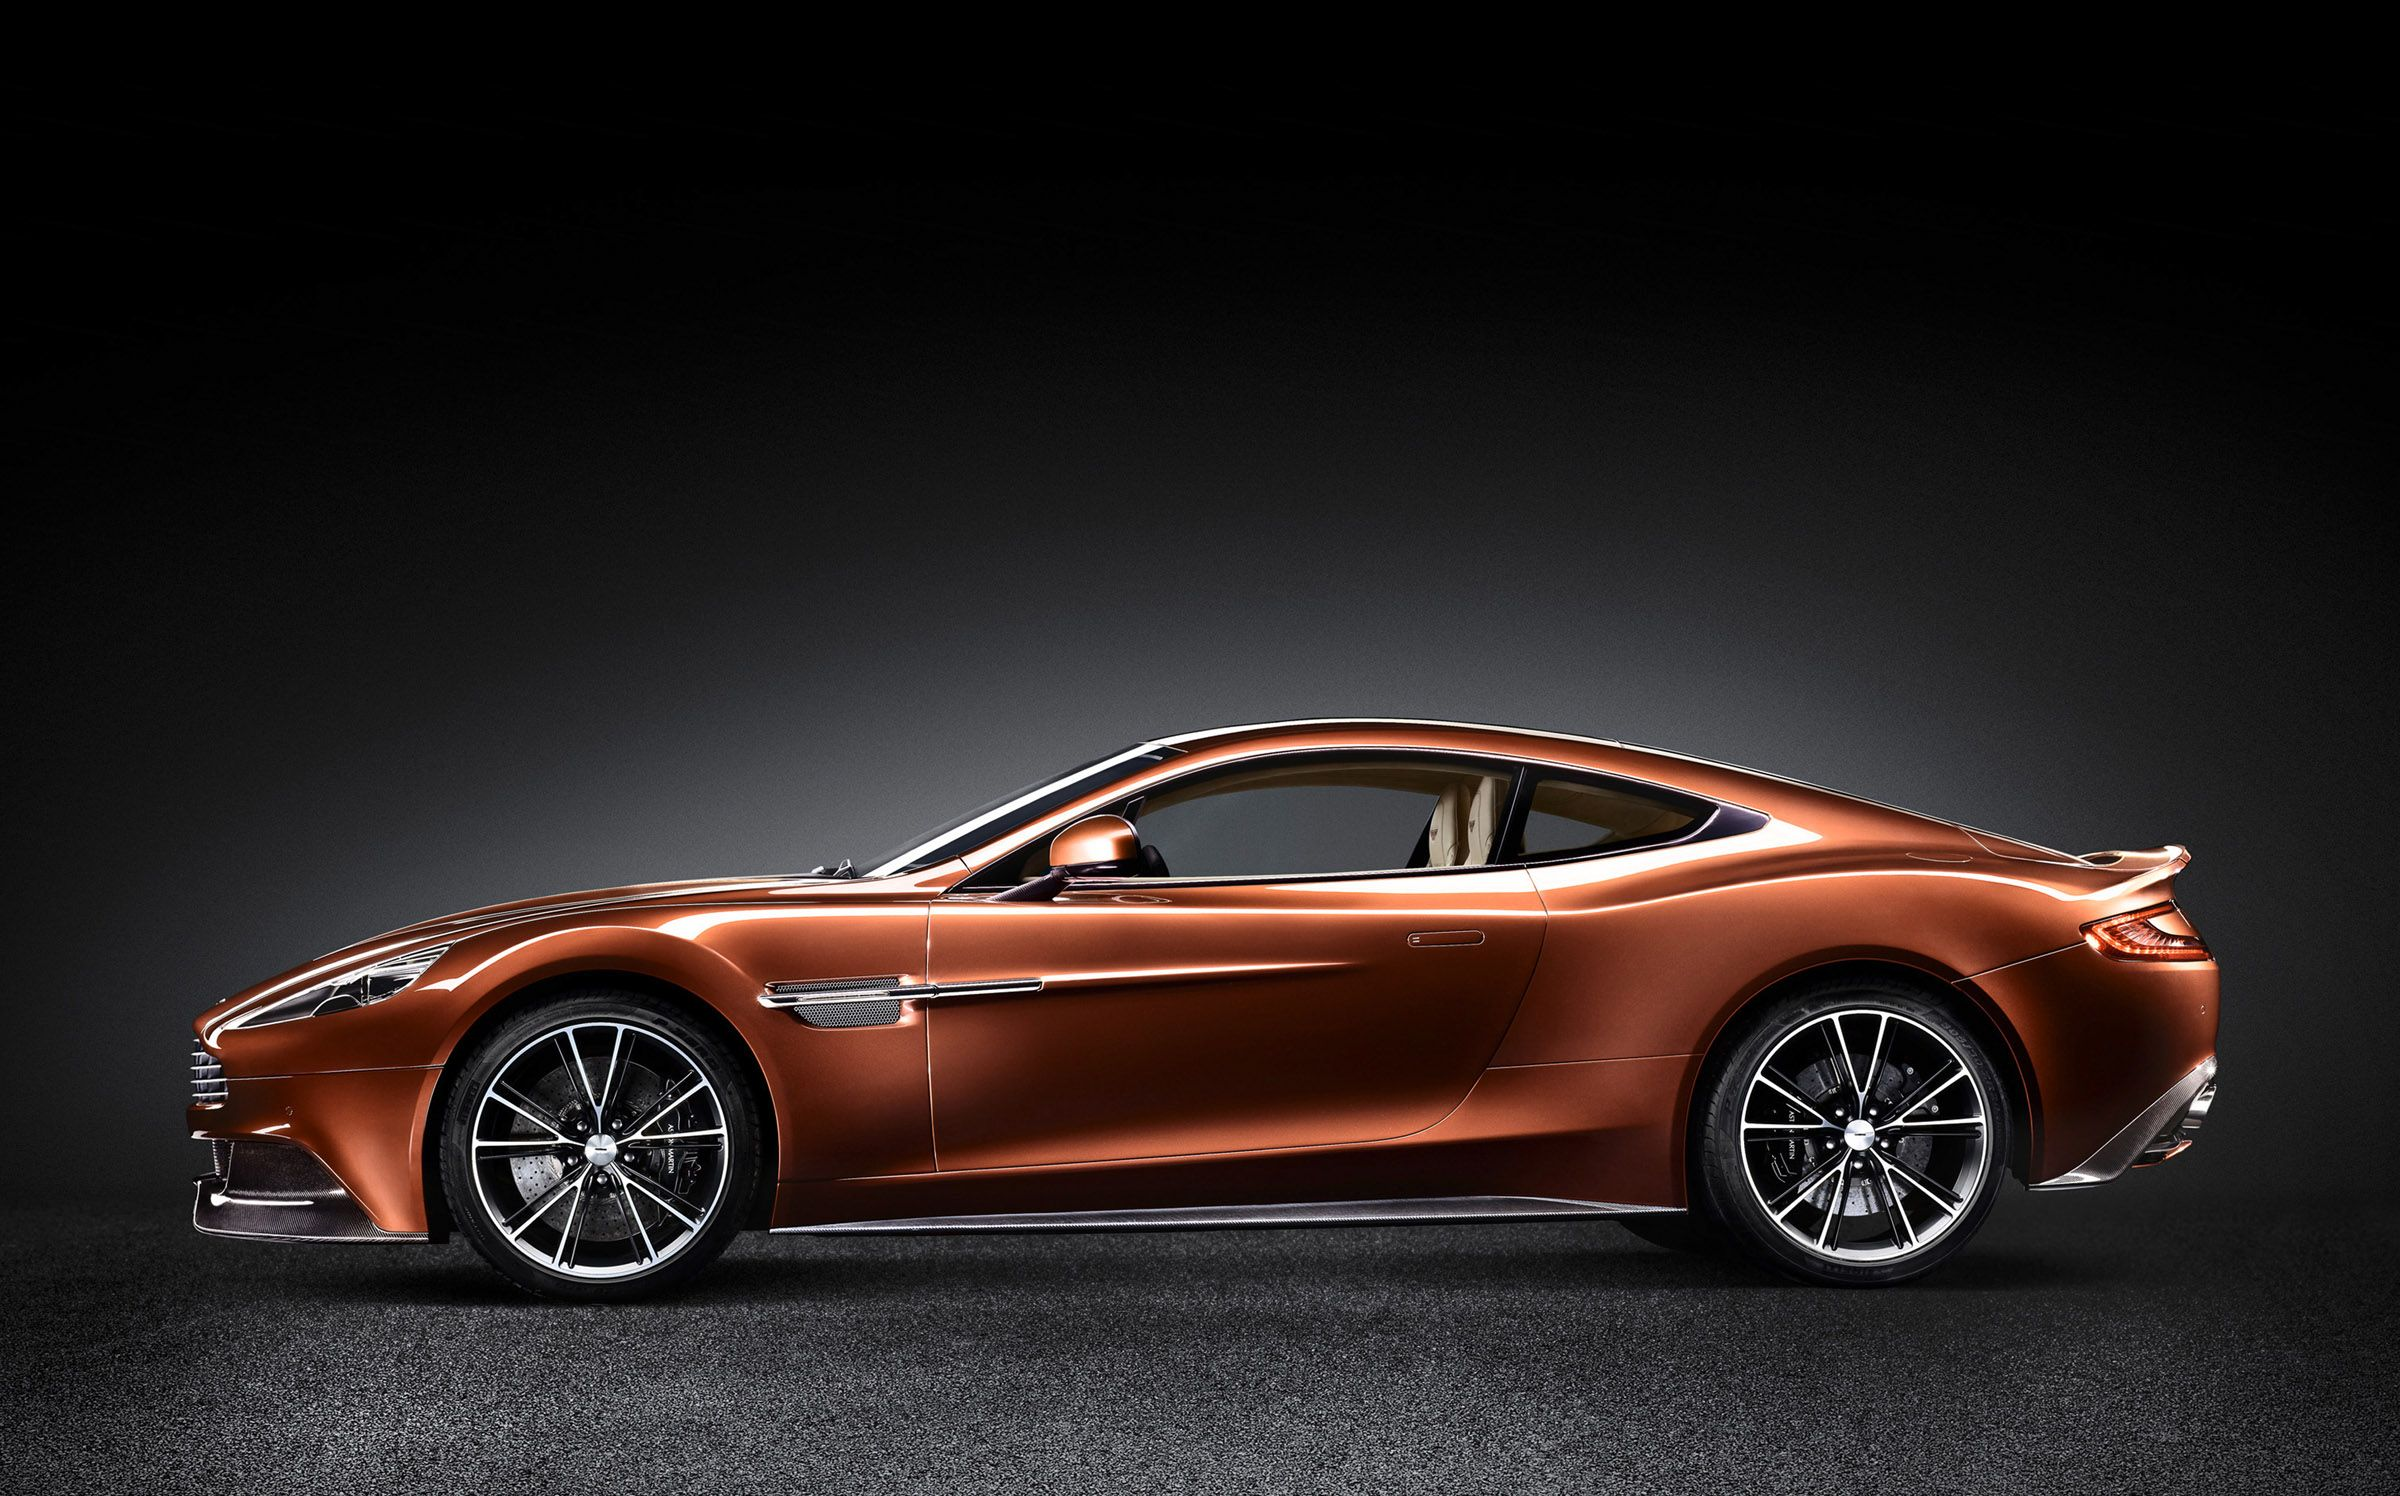 Sports Car Side 5817 Hd Wallpapers Car Design